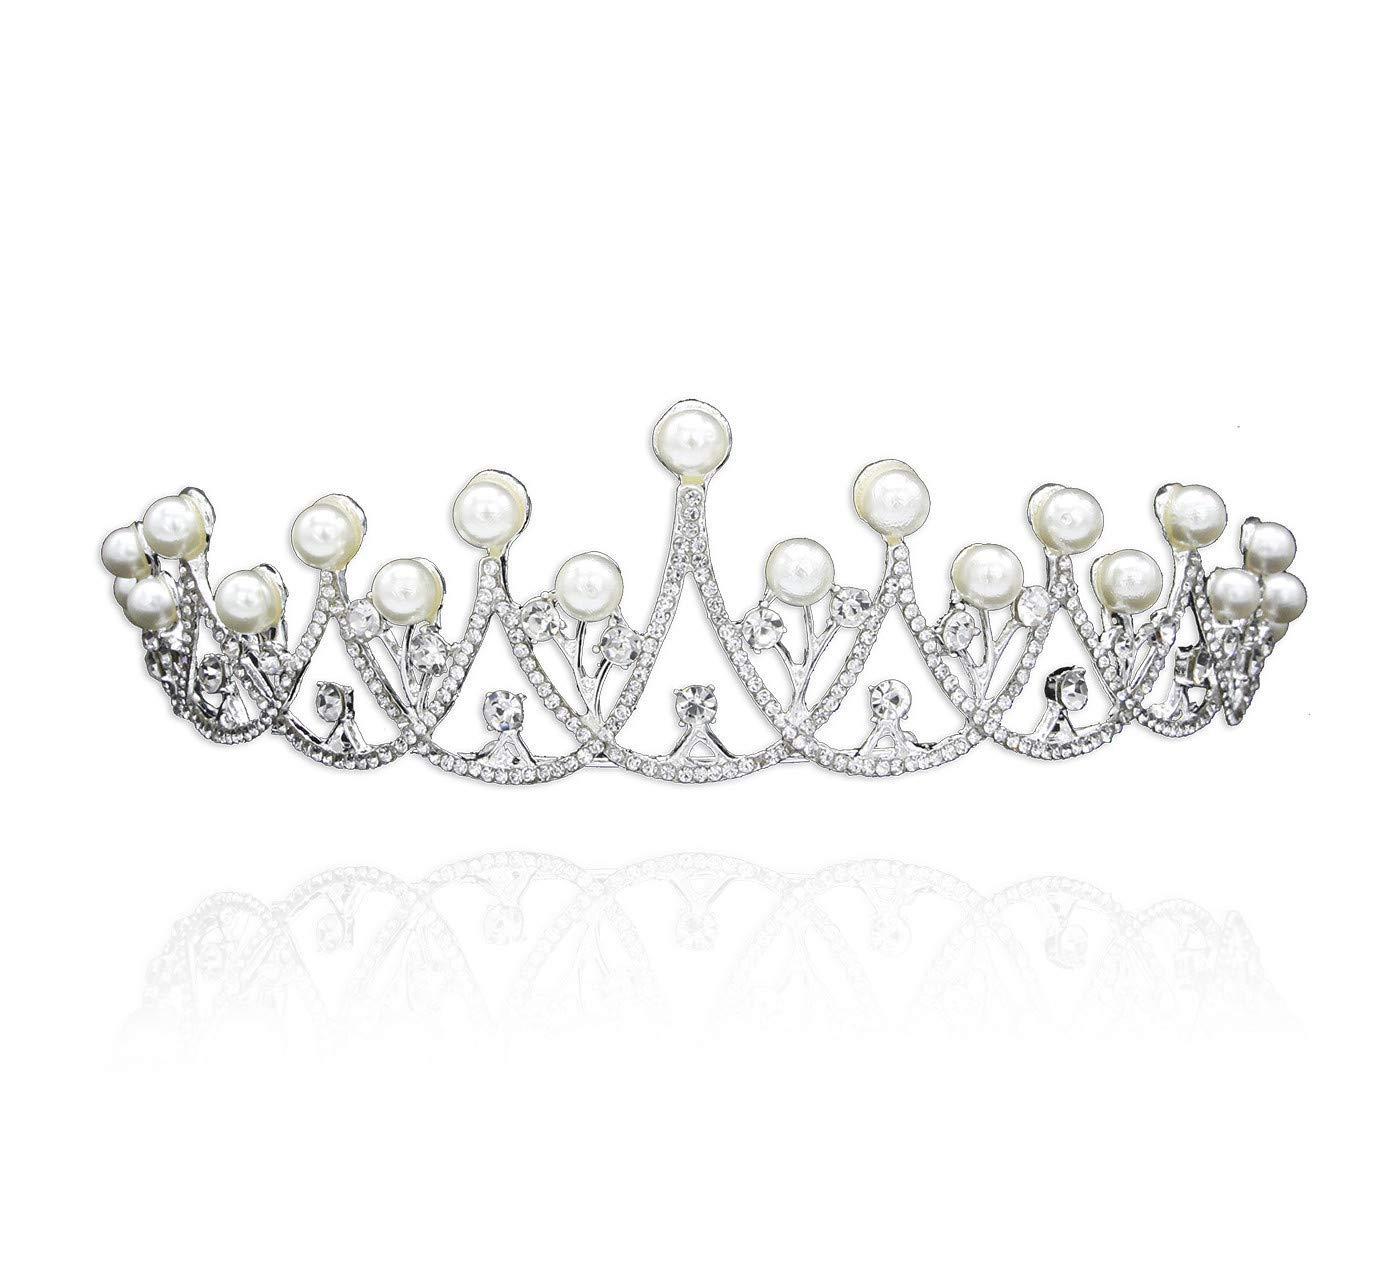 Wedding Crown, Bridal Wedding/Prom Hair Pins/Headdress Accessories/Party/Girls Pearl Diamond Bride Crown Hair Ornament Wedding Bride Accessories Wedding Dress Accessories by Junson (Image #1)